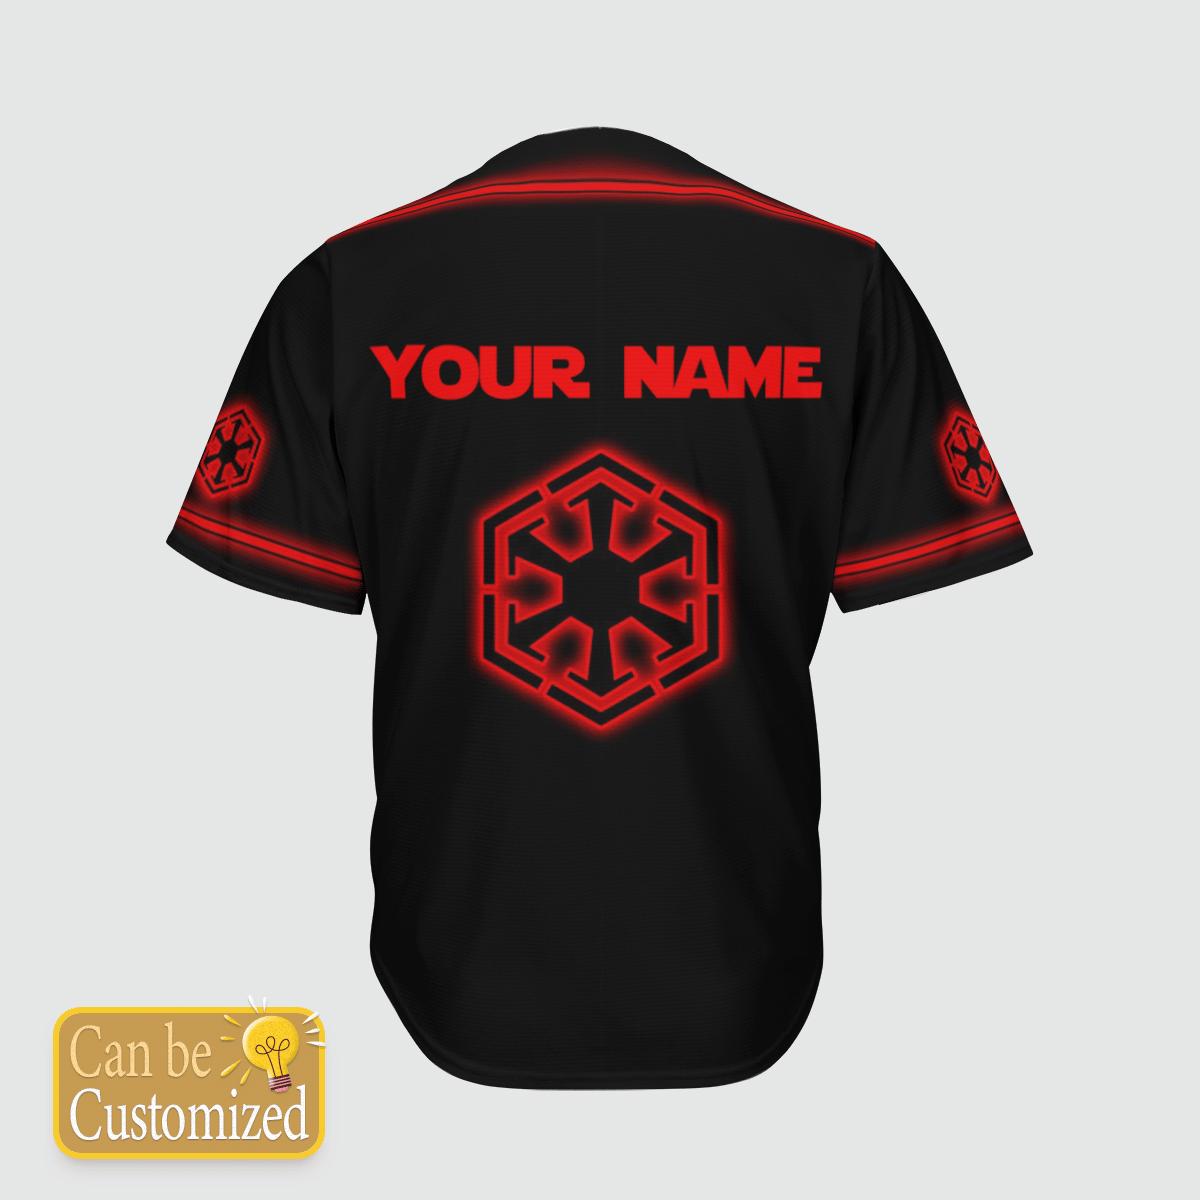 Sith Empire custom name baseball shirt 1